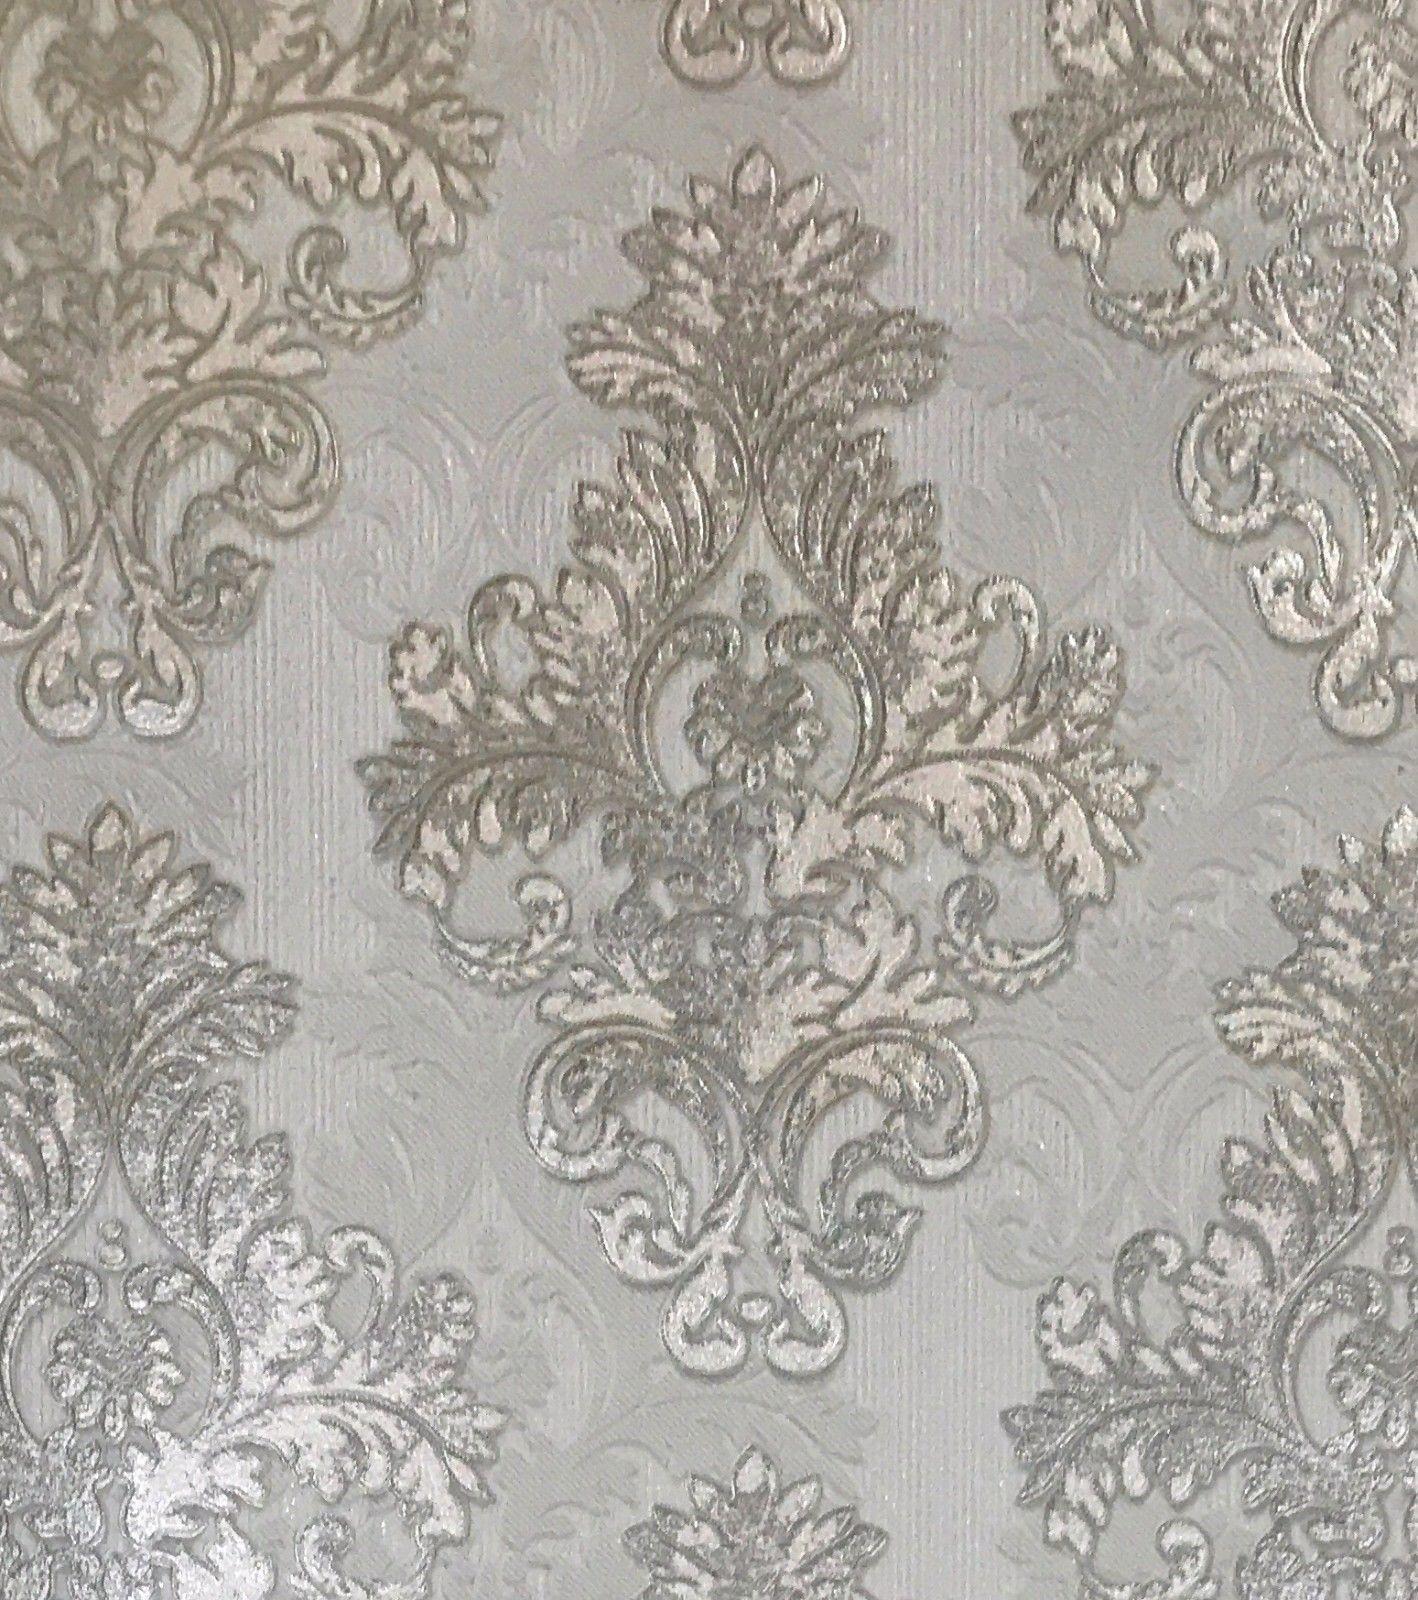 Vintage style paper wallpaper Diamond damask gray beige gold metallic textured